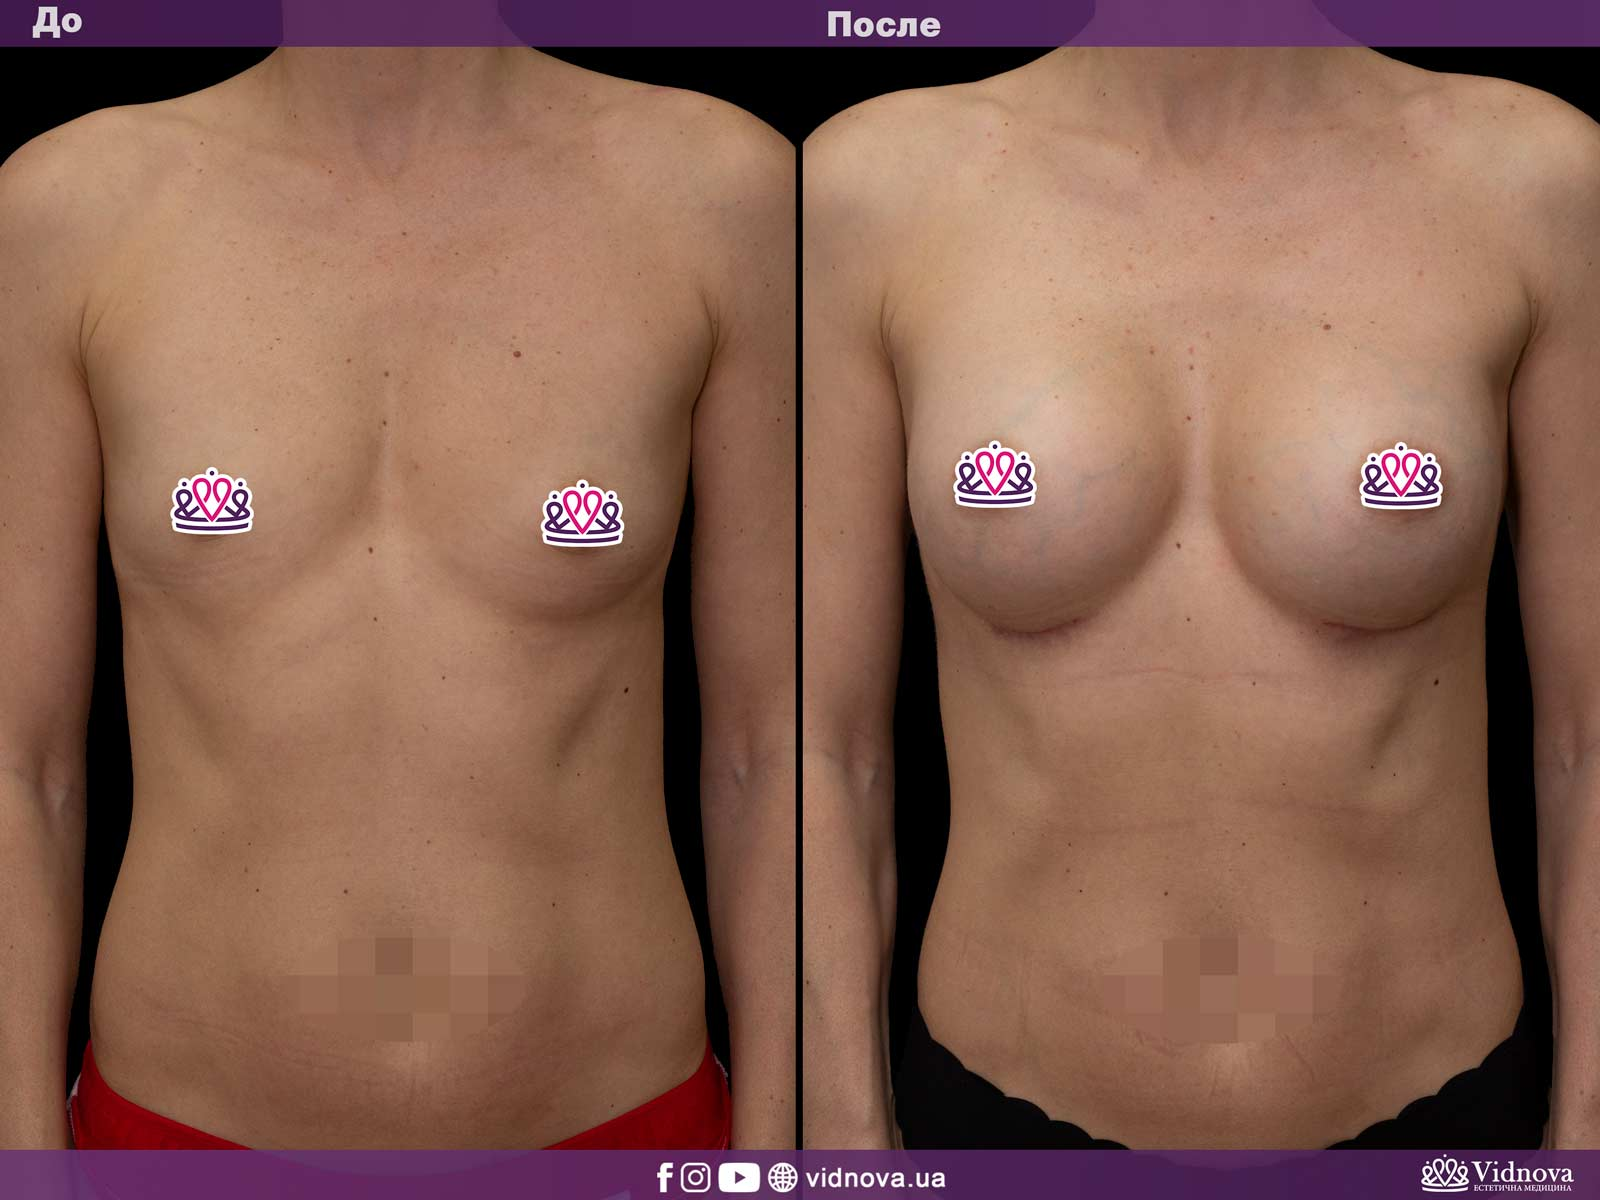 Увеличение груди: Фото ДО и ПОСЛЕ - Пример №22-1 - Клиника Vidnova